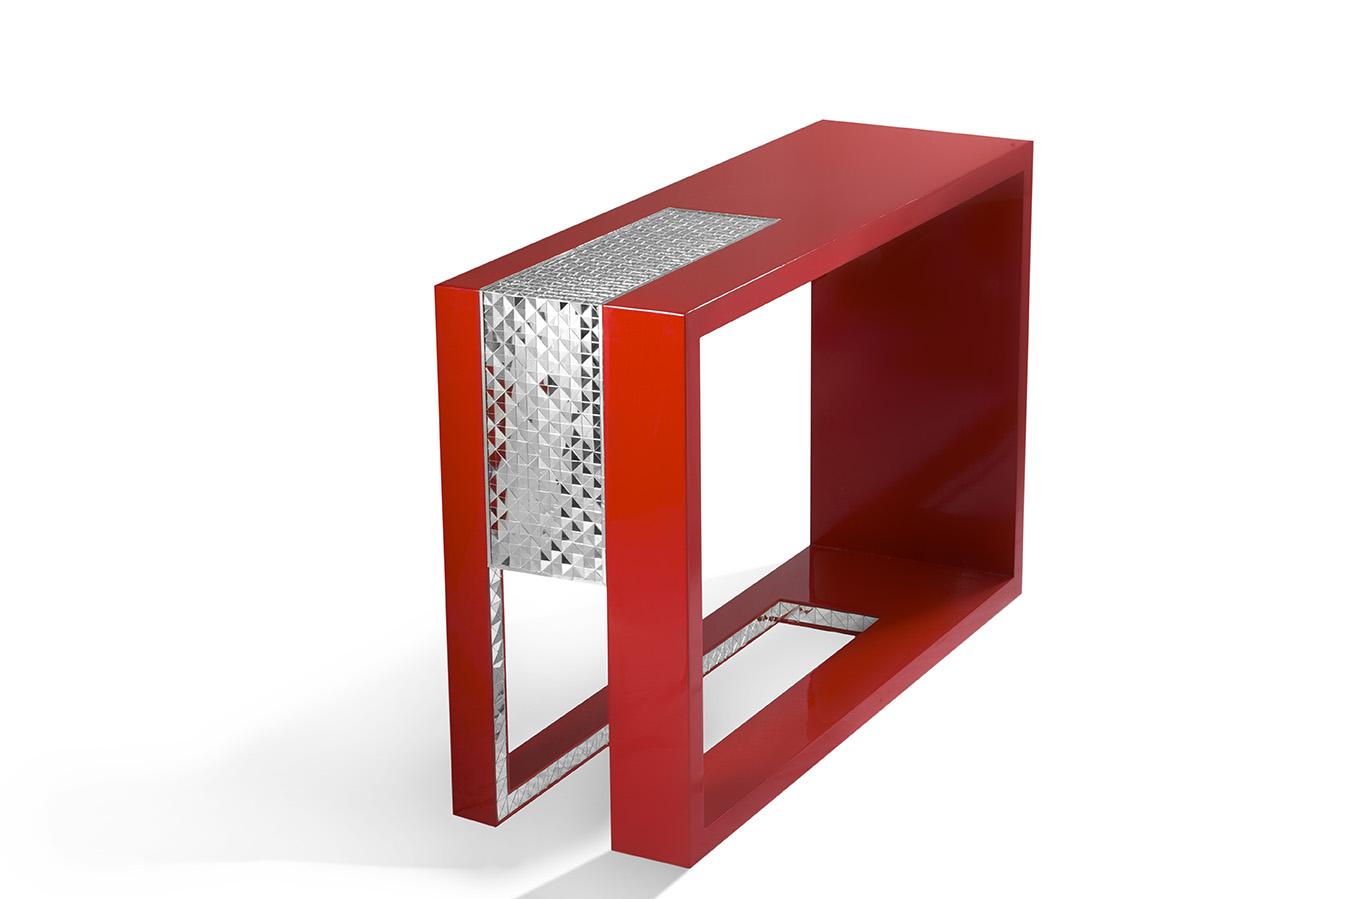 damavand console table